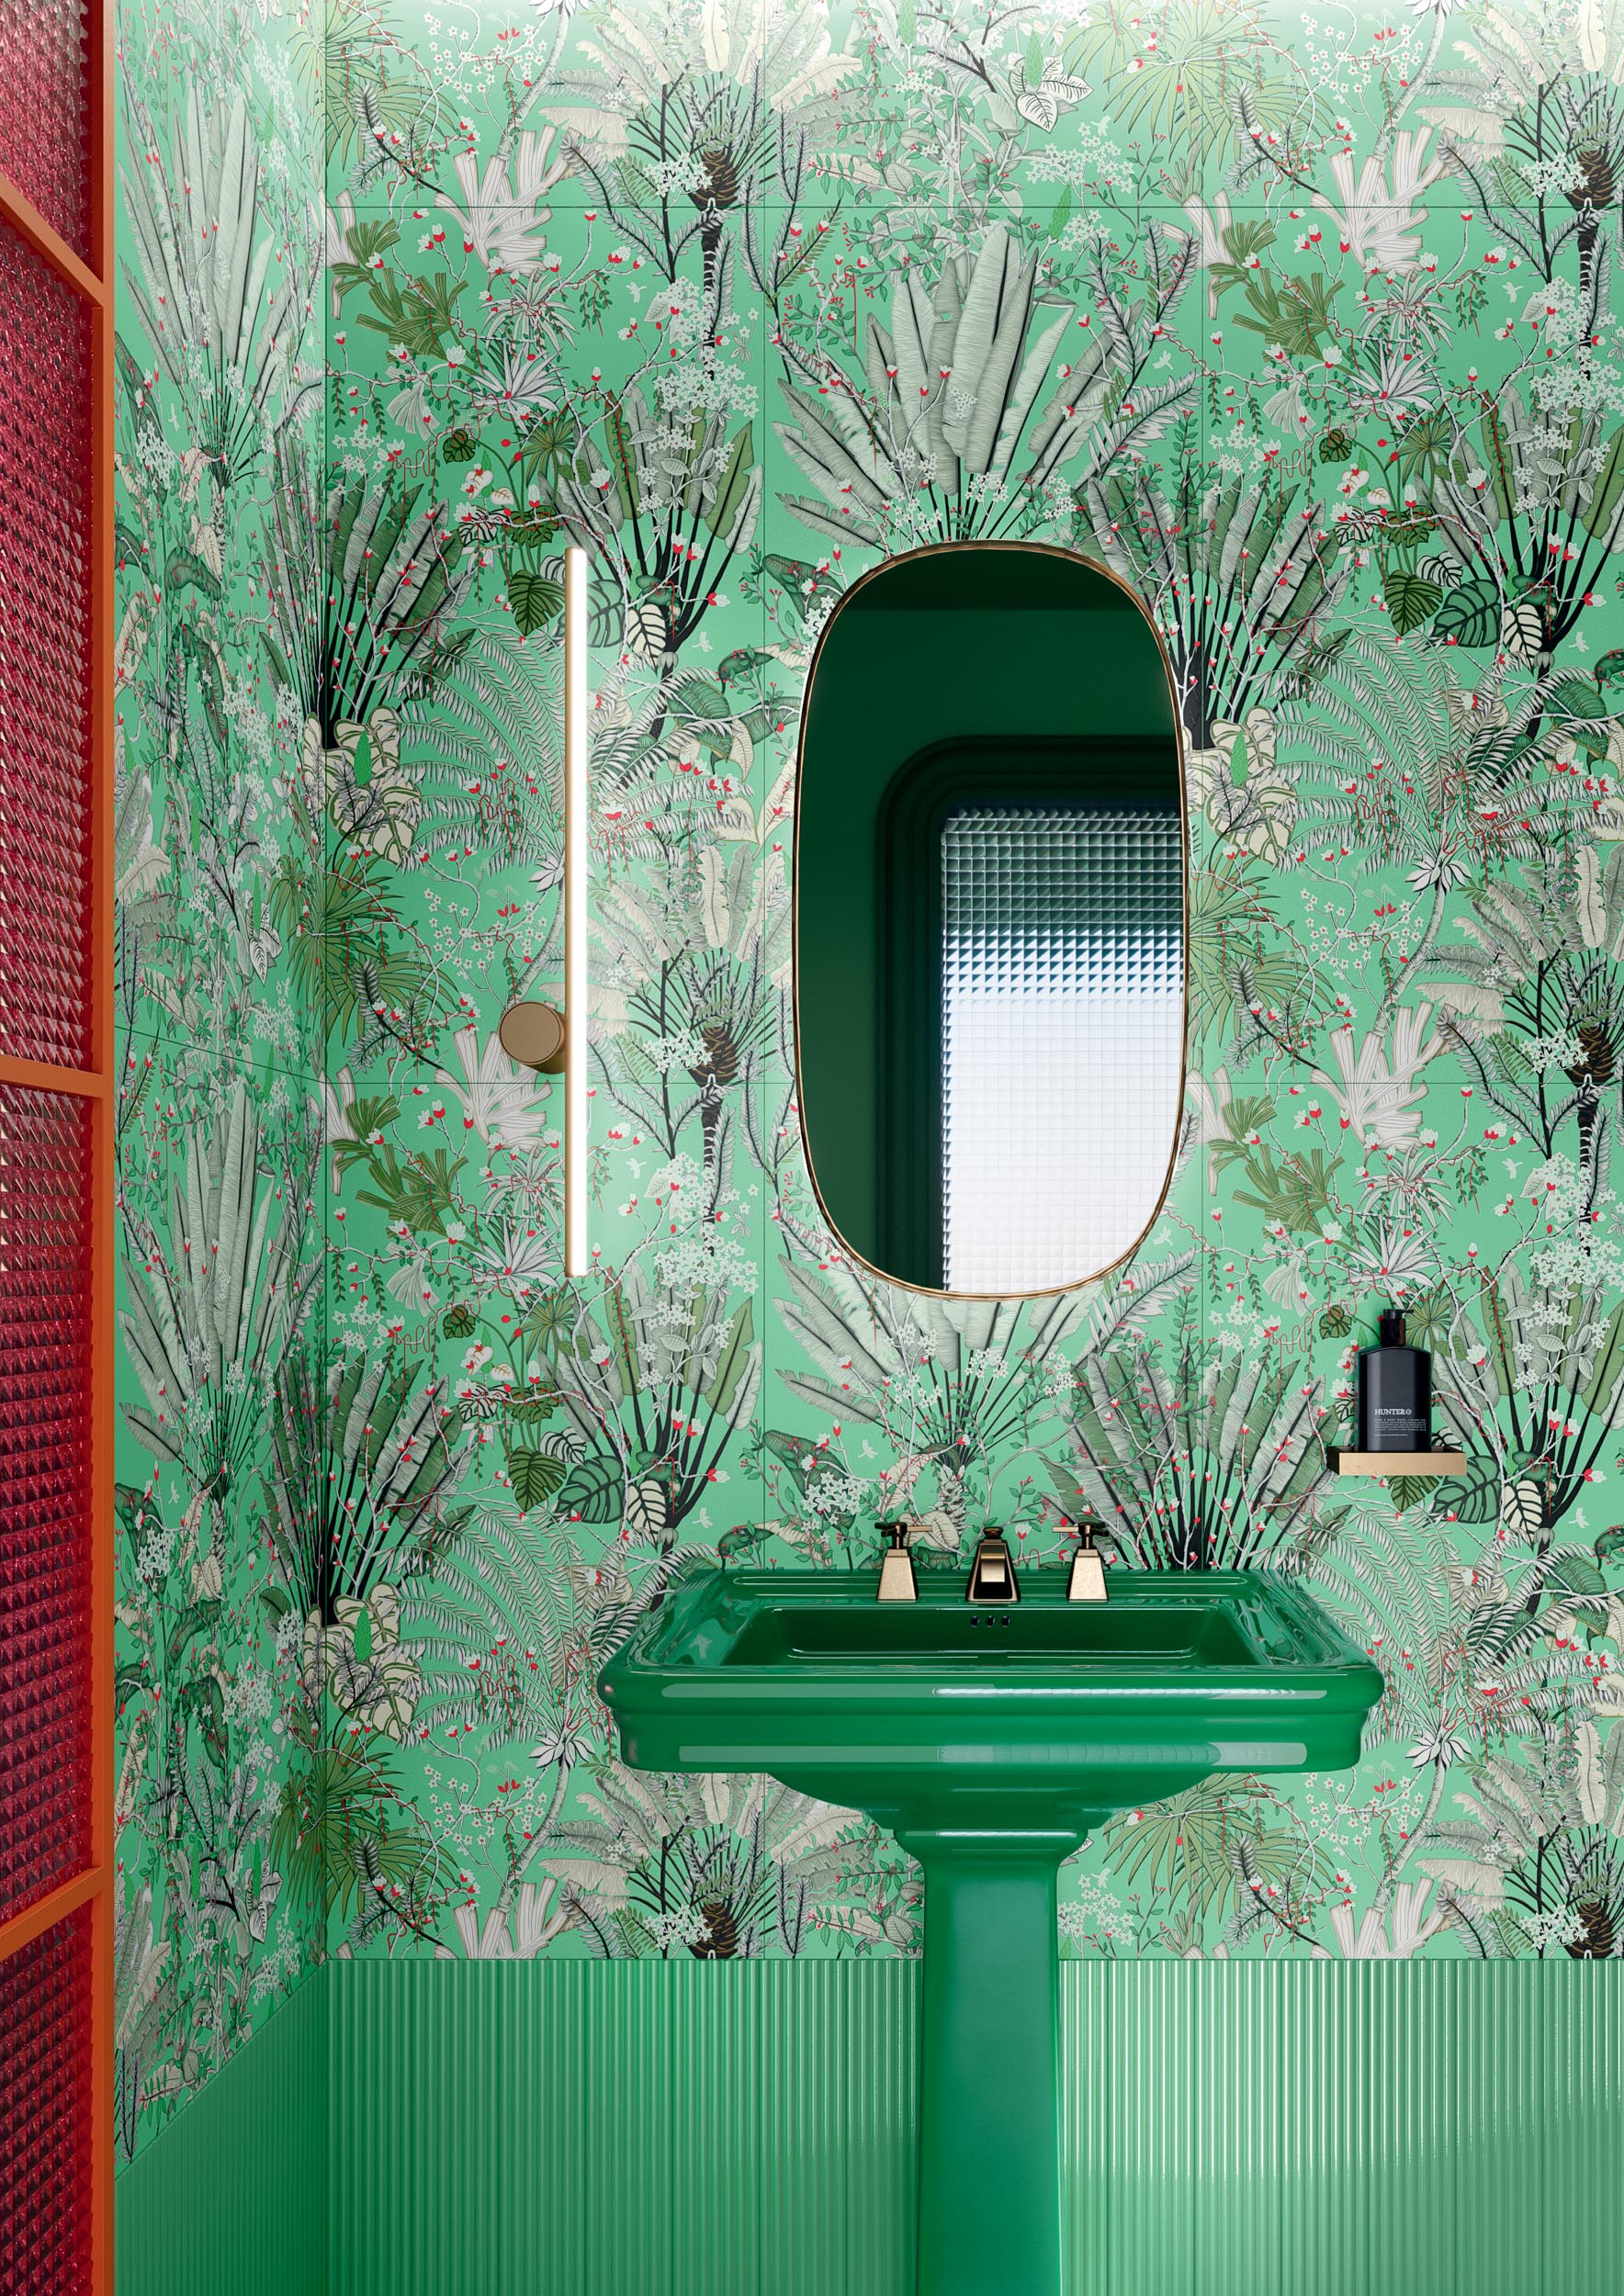 "Wall Paper41 Pro Pilar 50x100 20""x40"" / Superclassica SCB Pli Verde 10x40 4""x16"""